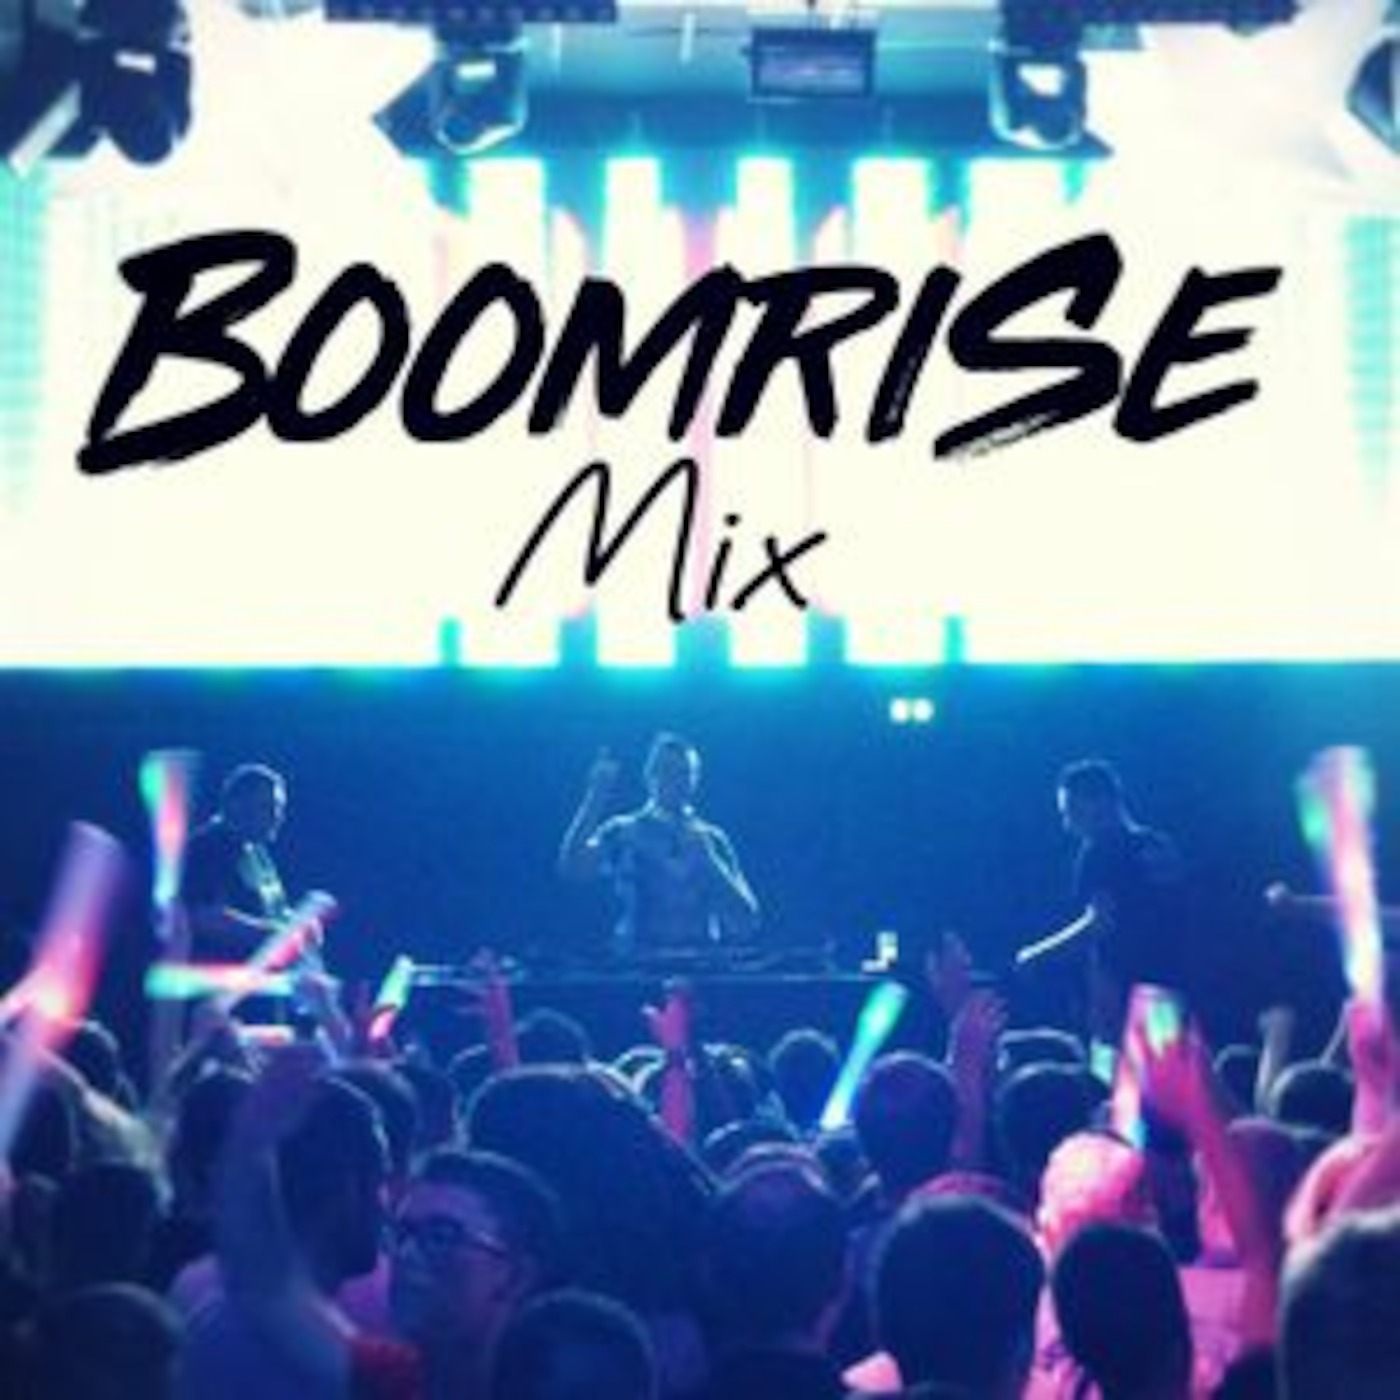 BoomriSe - MAY 2019 MIX BoomriSe Mix podcast